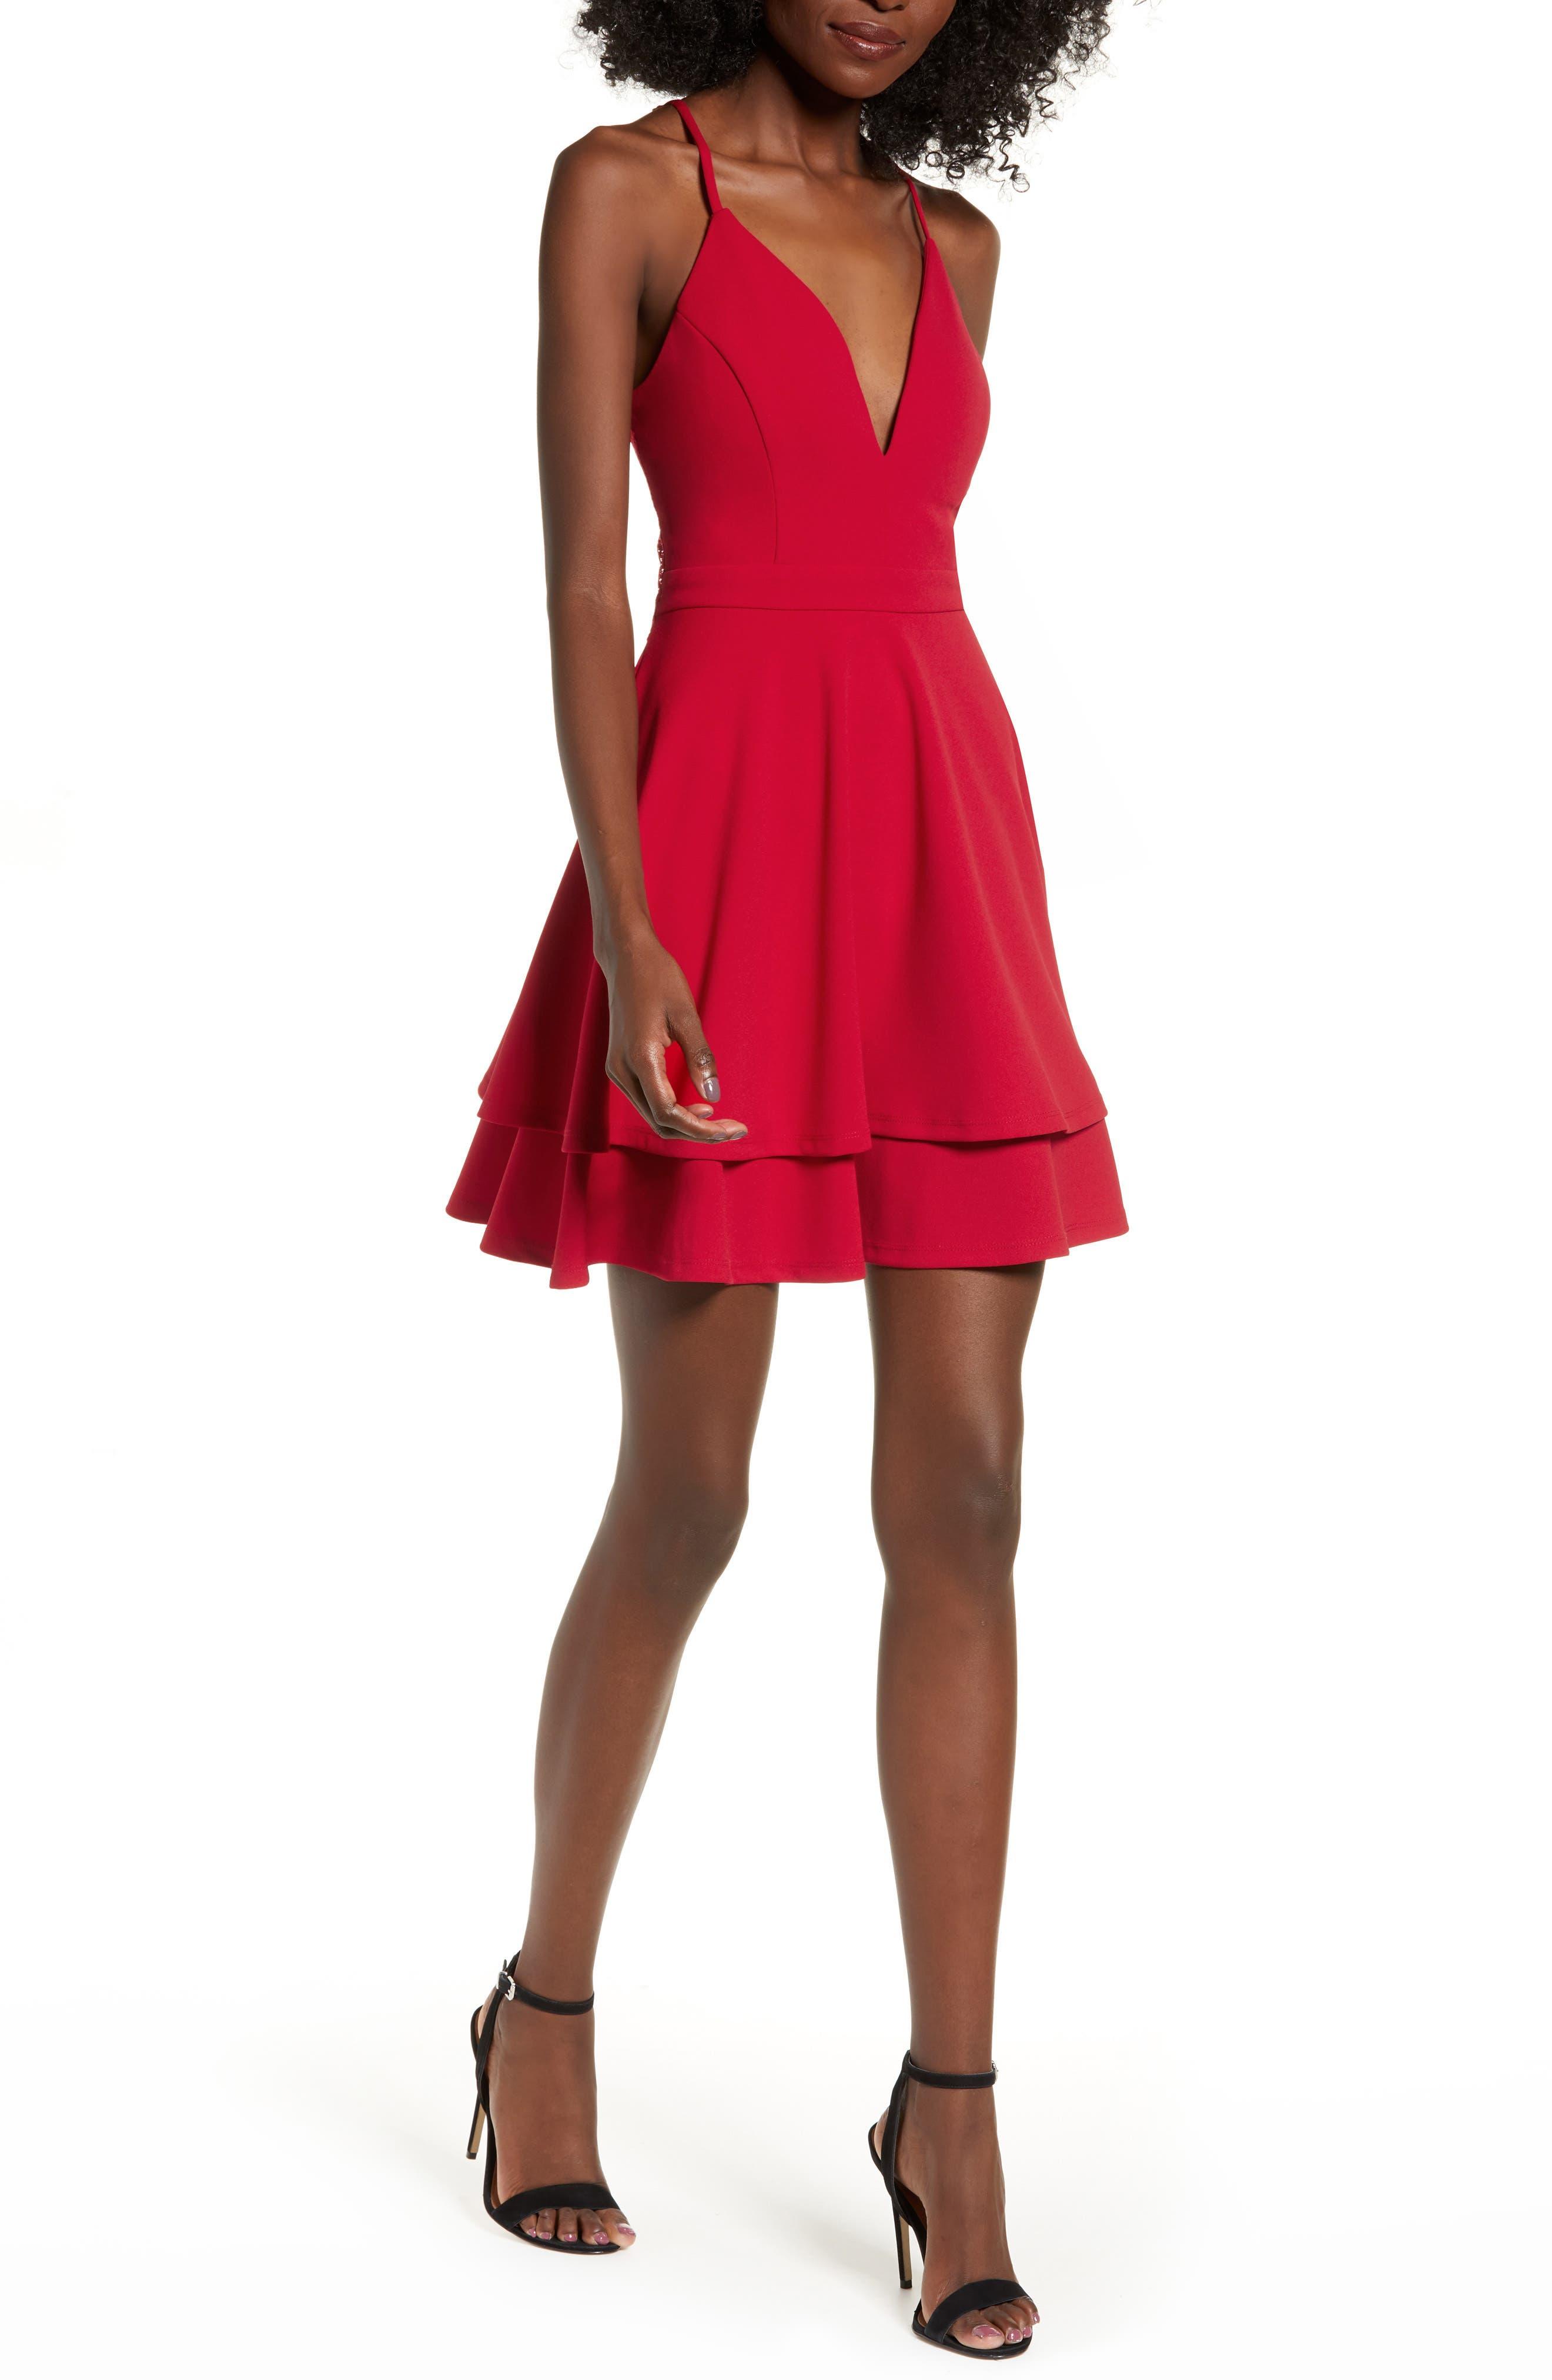 Love, Nickie Lew V-Neck Skater Dress, Red